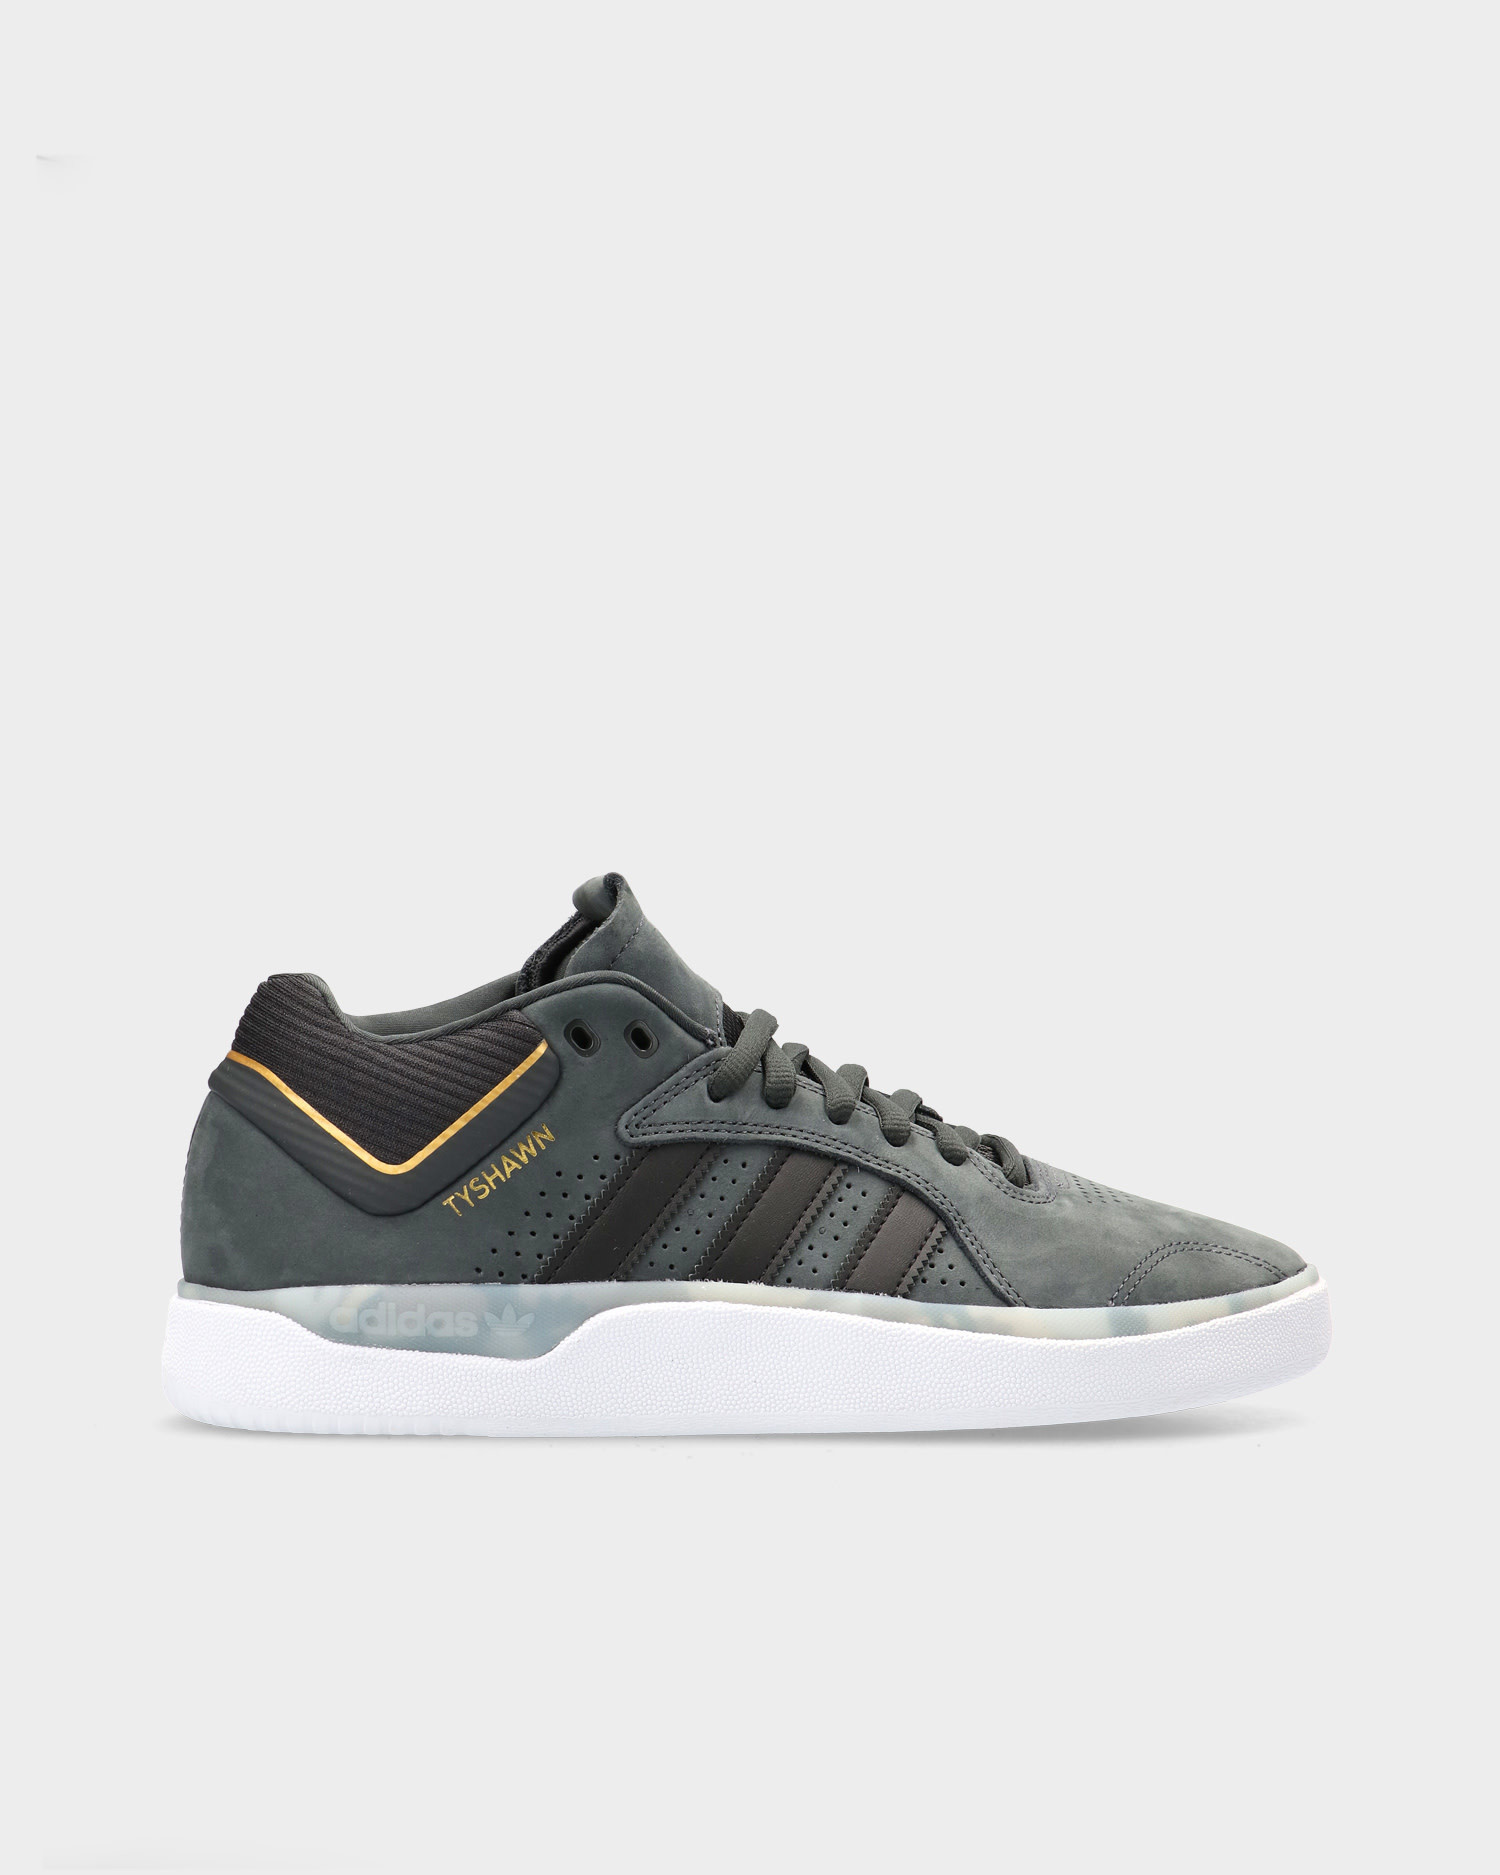 Adidas Skateboarding Tyshawn Carbon/Cblack/Goldmt